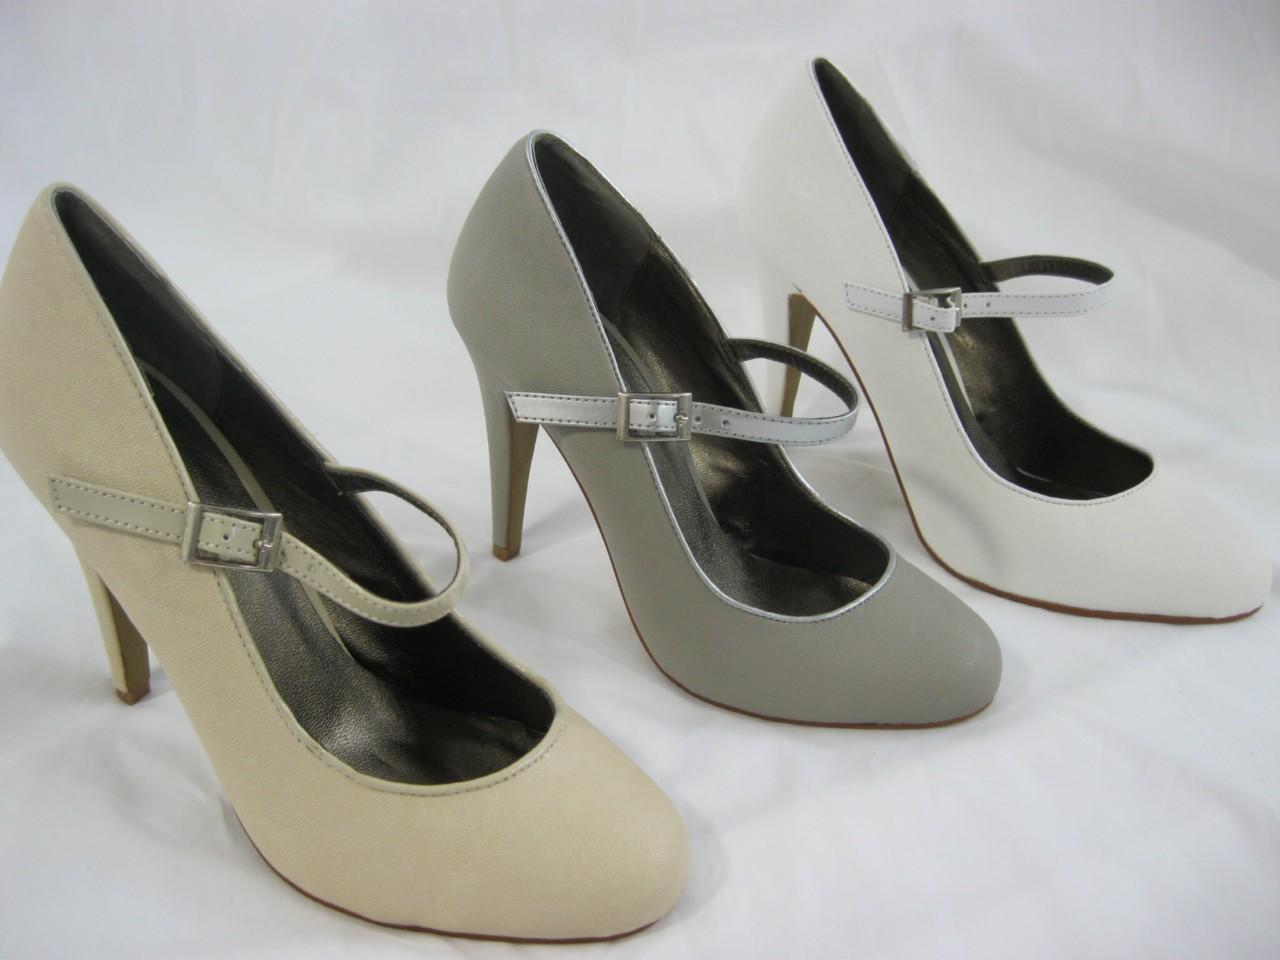 Rascal White / Cream / Grey Mary Jane Court Shoe 3 4 5 6 7 8 Cute